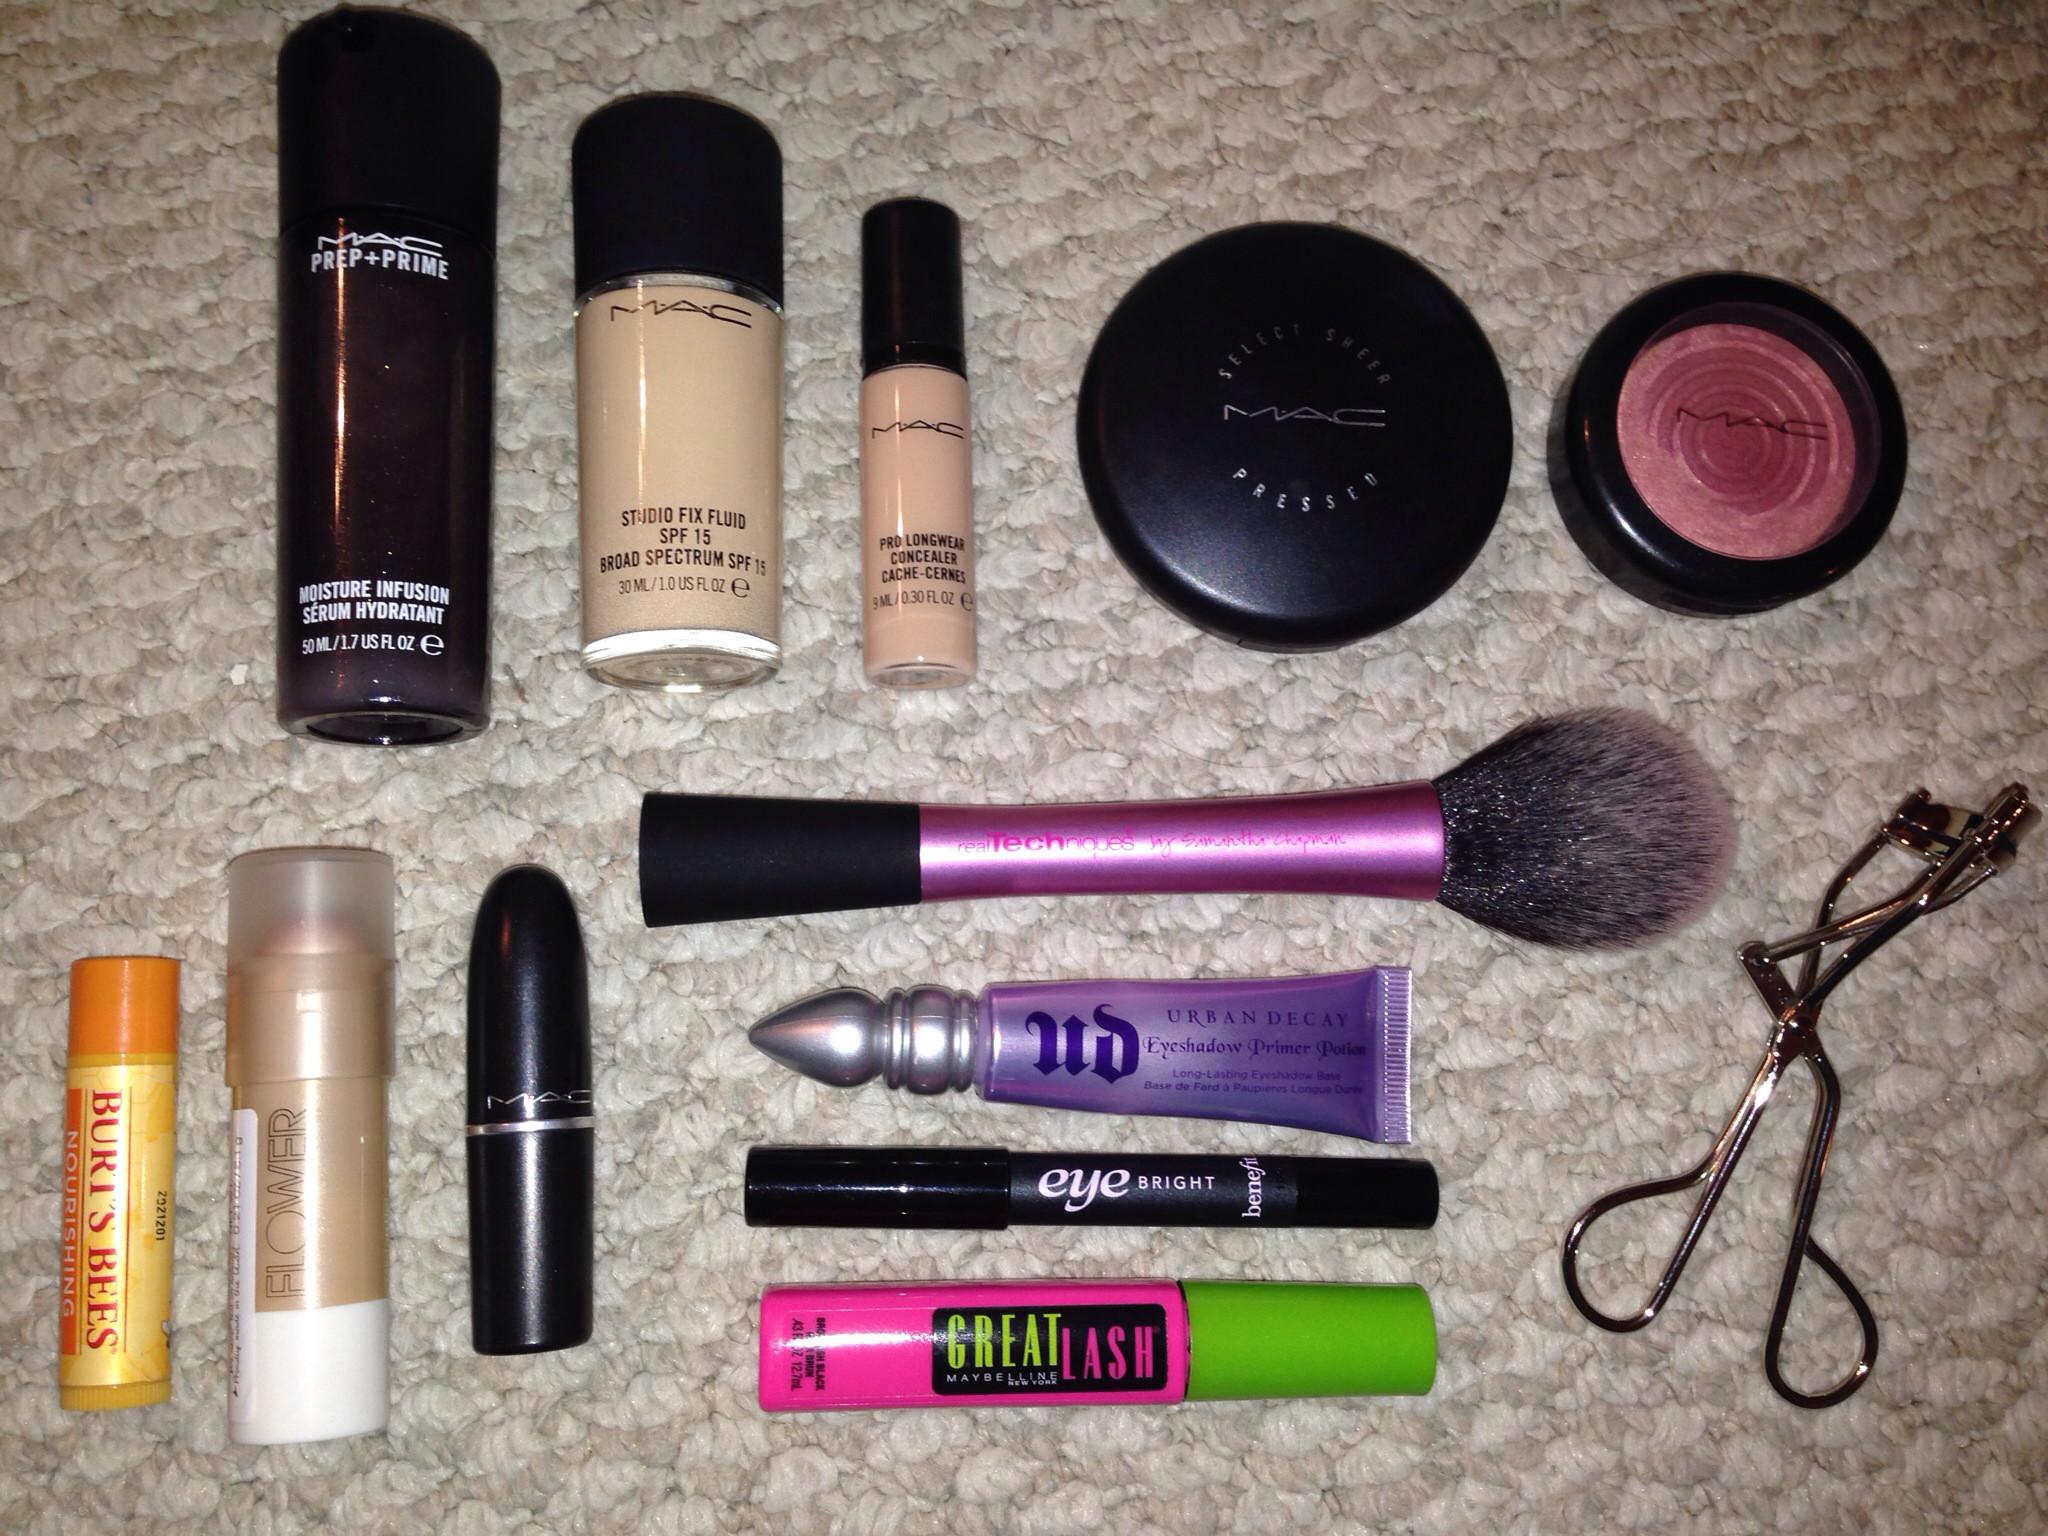 Makeup. Cosmetics. Mac cosmetics prep and prime moisture infusion,